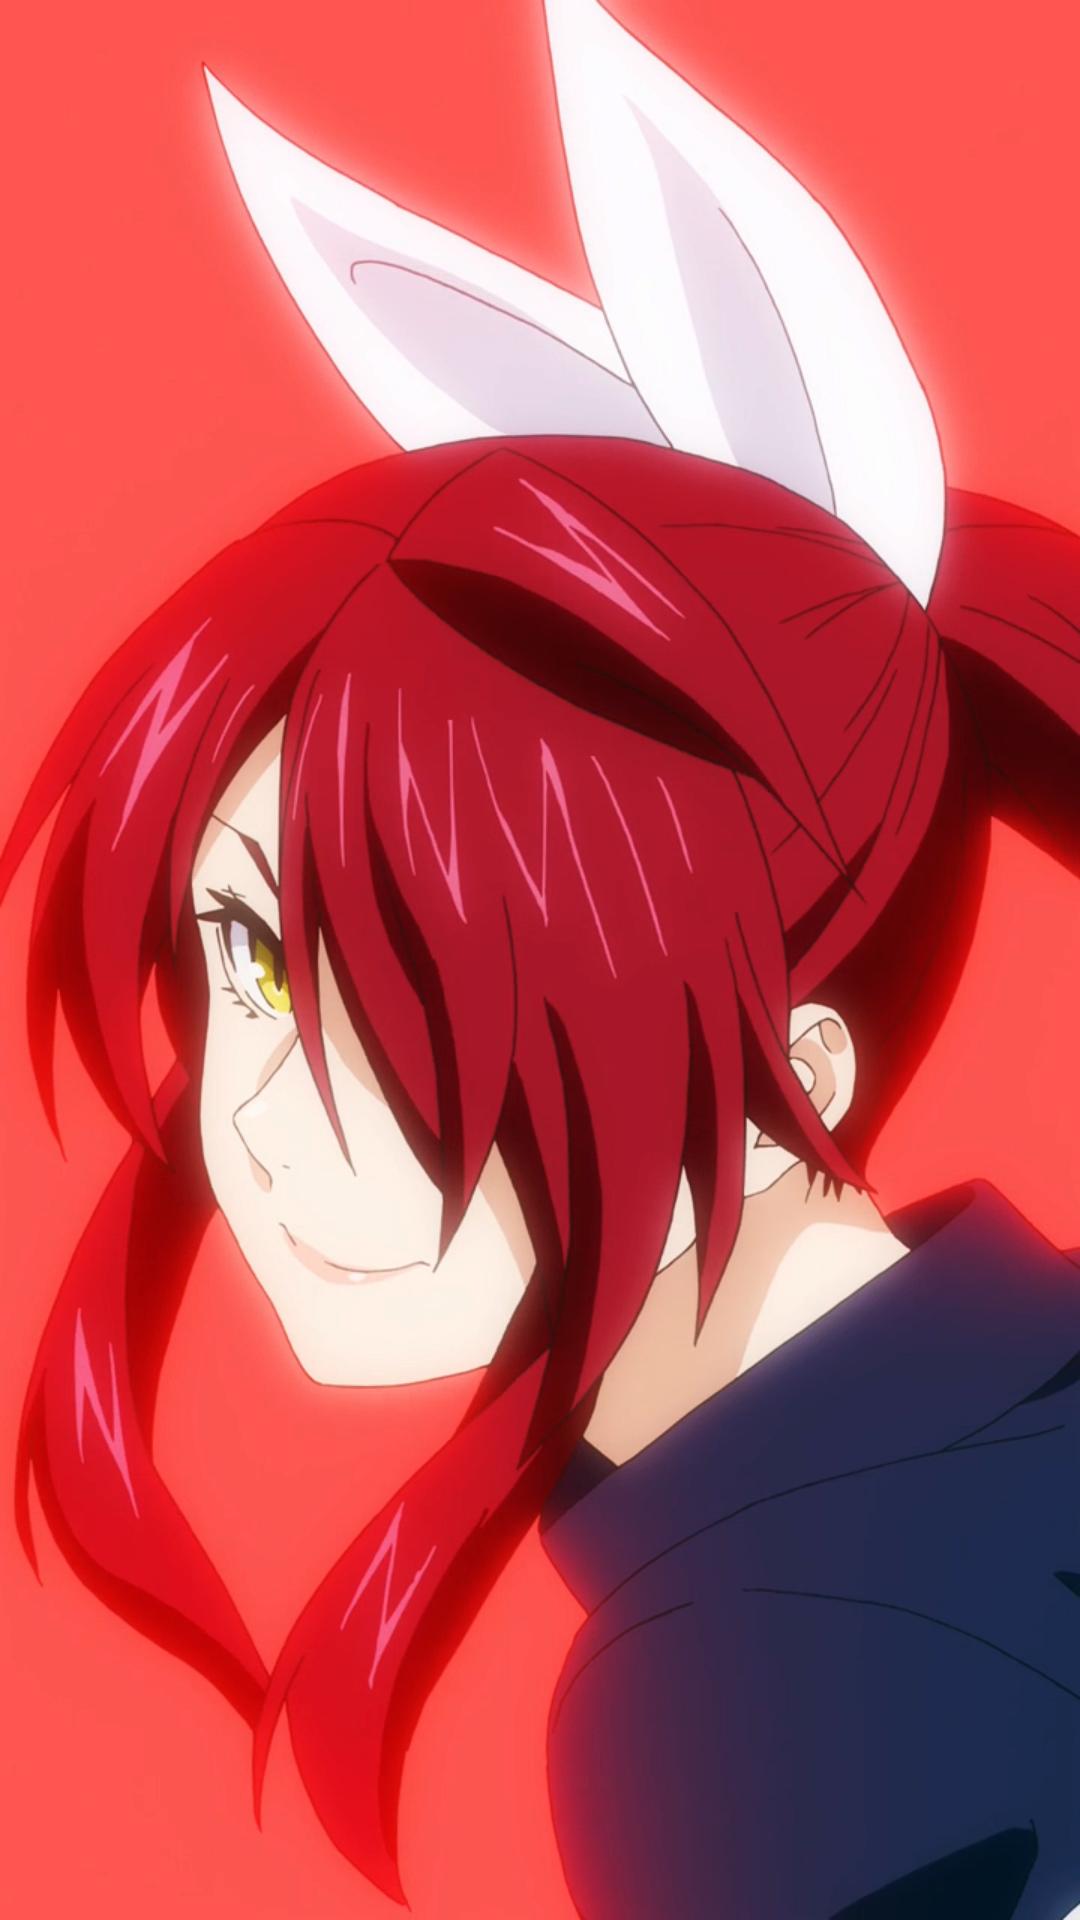 Kobayashi Rindou Shokugeki no Souma anime fall 2019